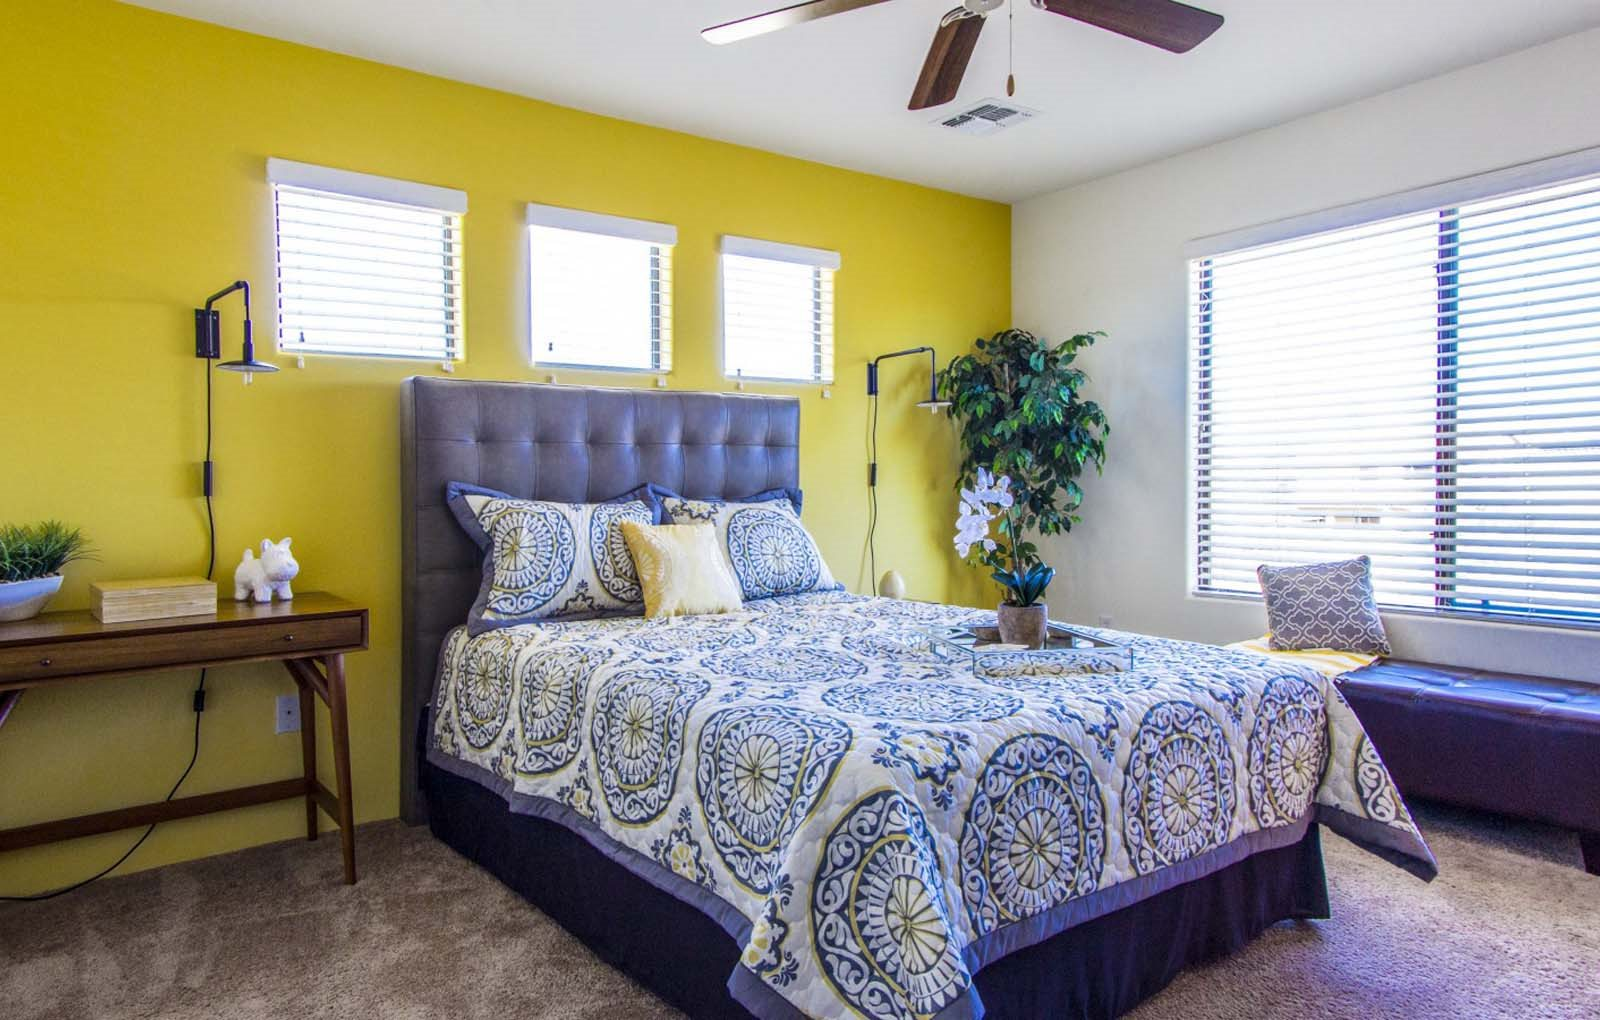 Apartments For Rent   Galeria Del Rio Apartments   Tucson, AZ